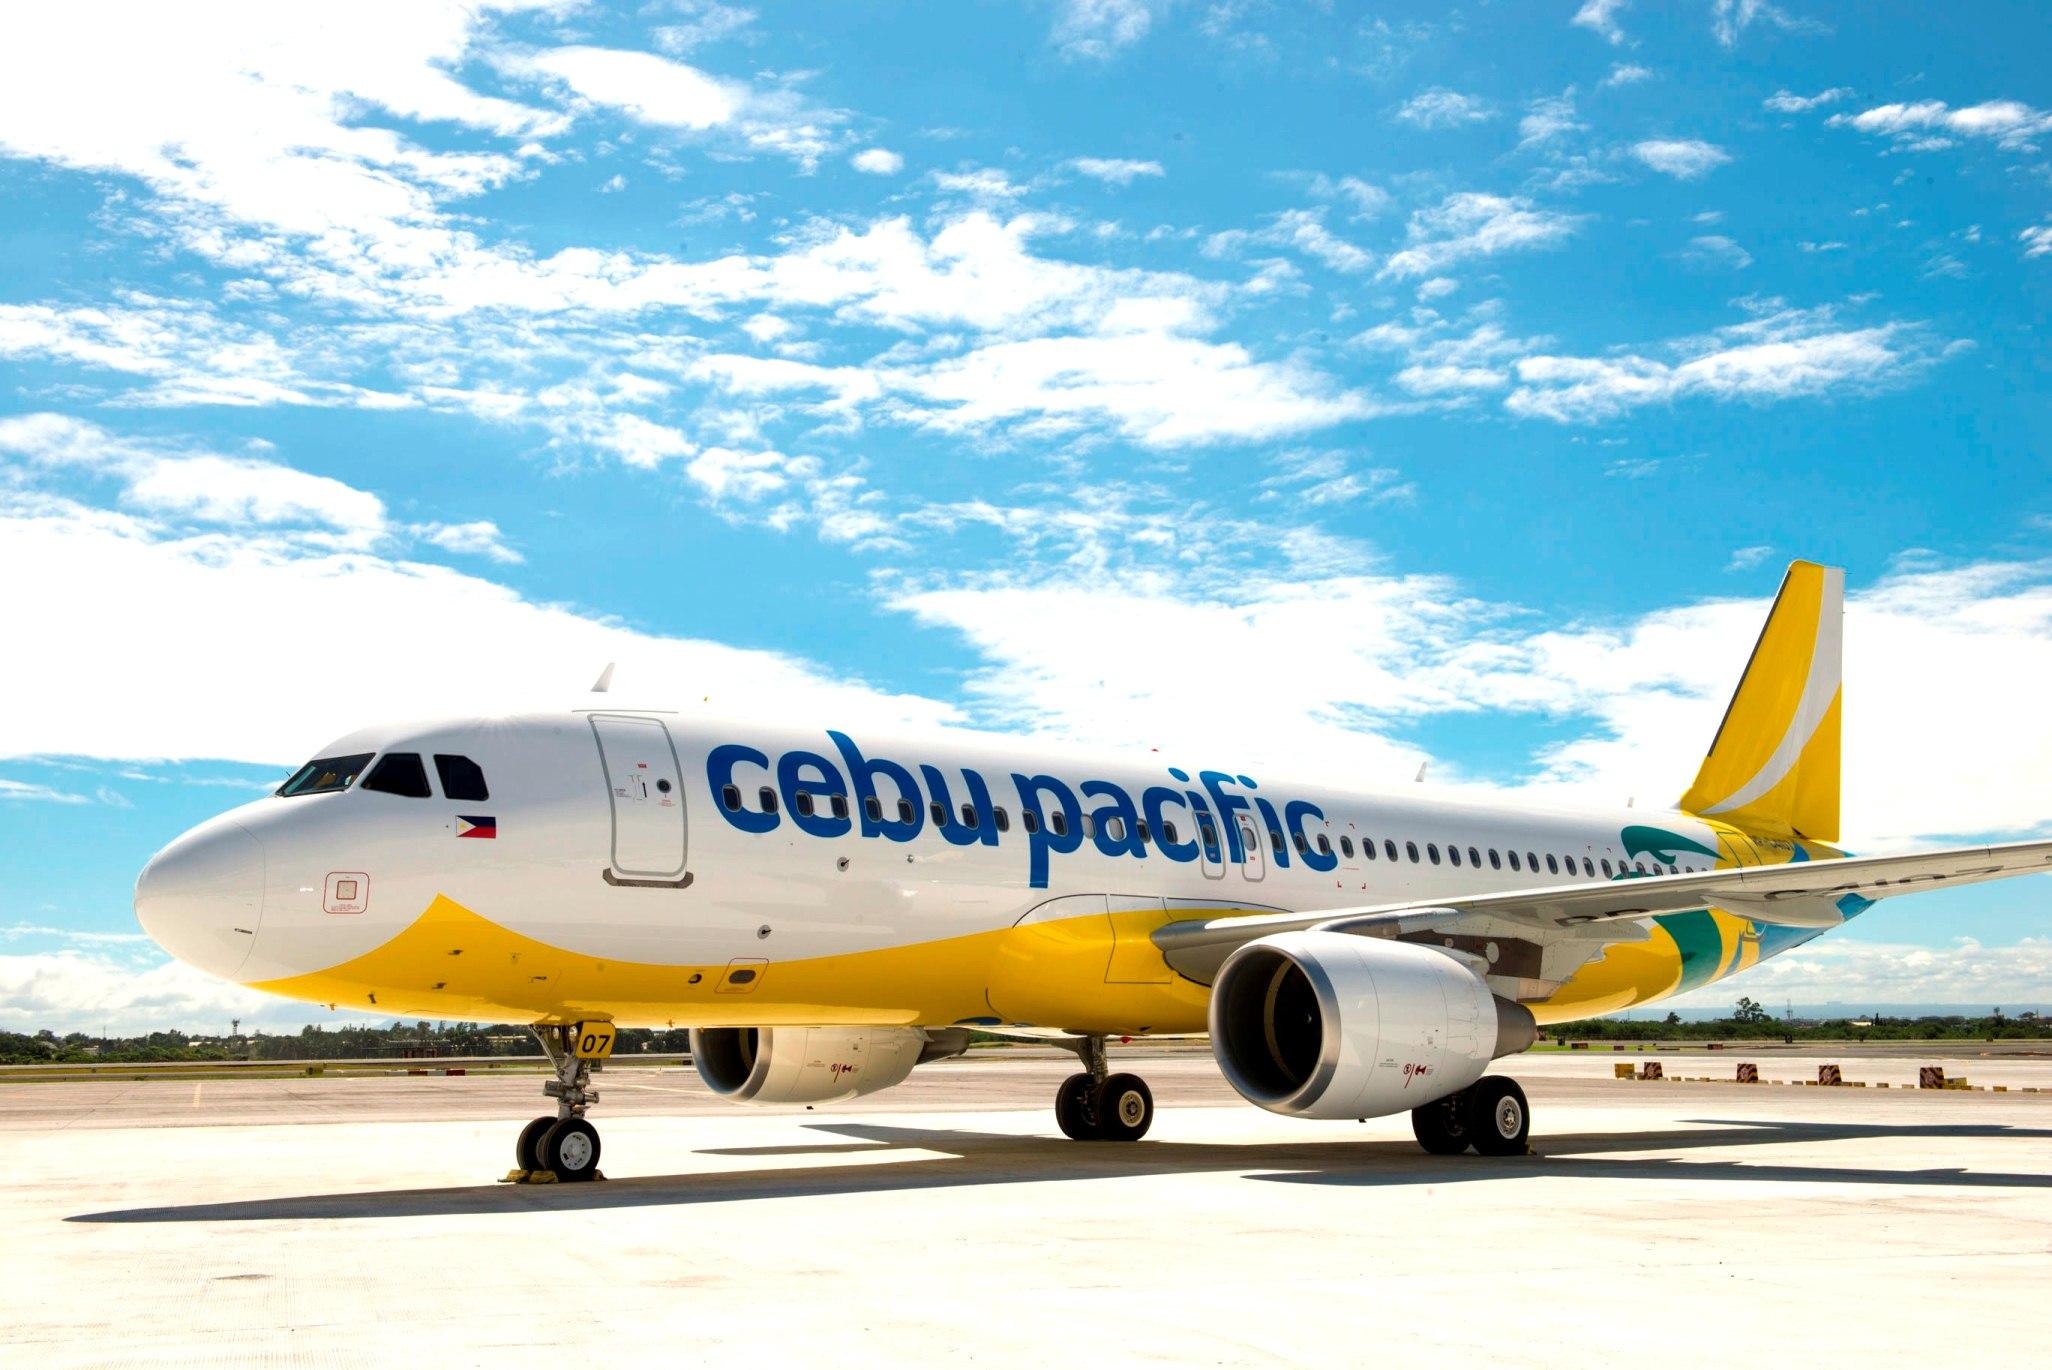 Cebu Pacific Air's new livery